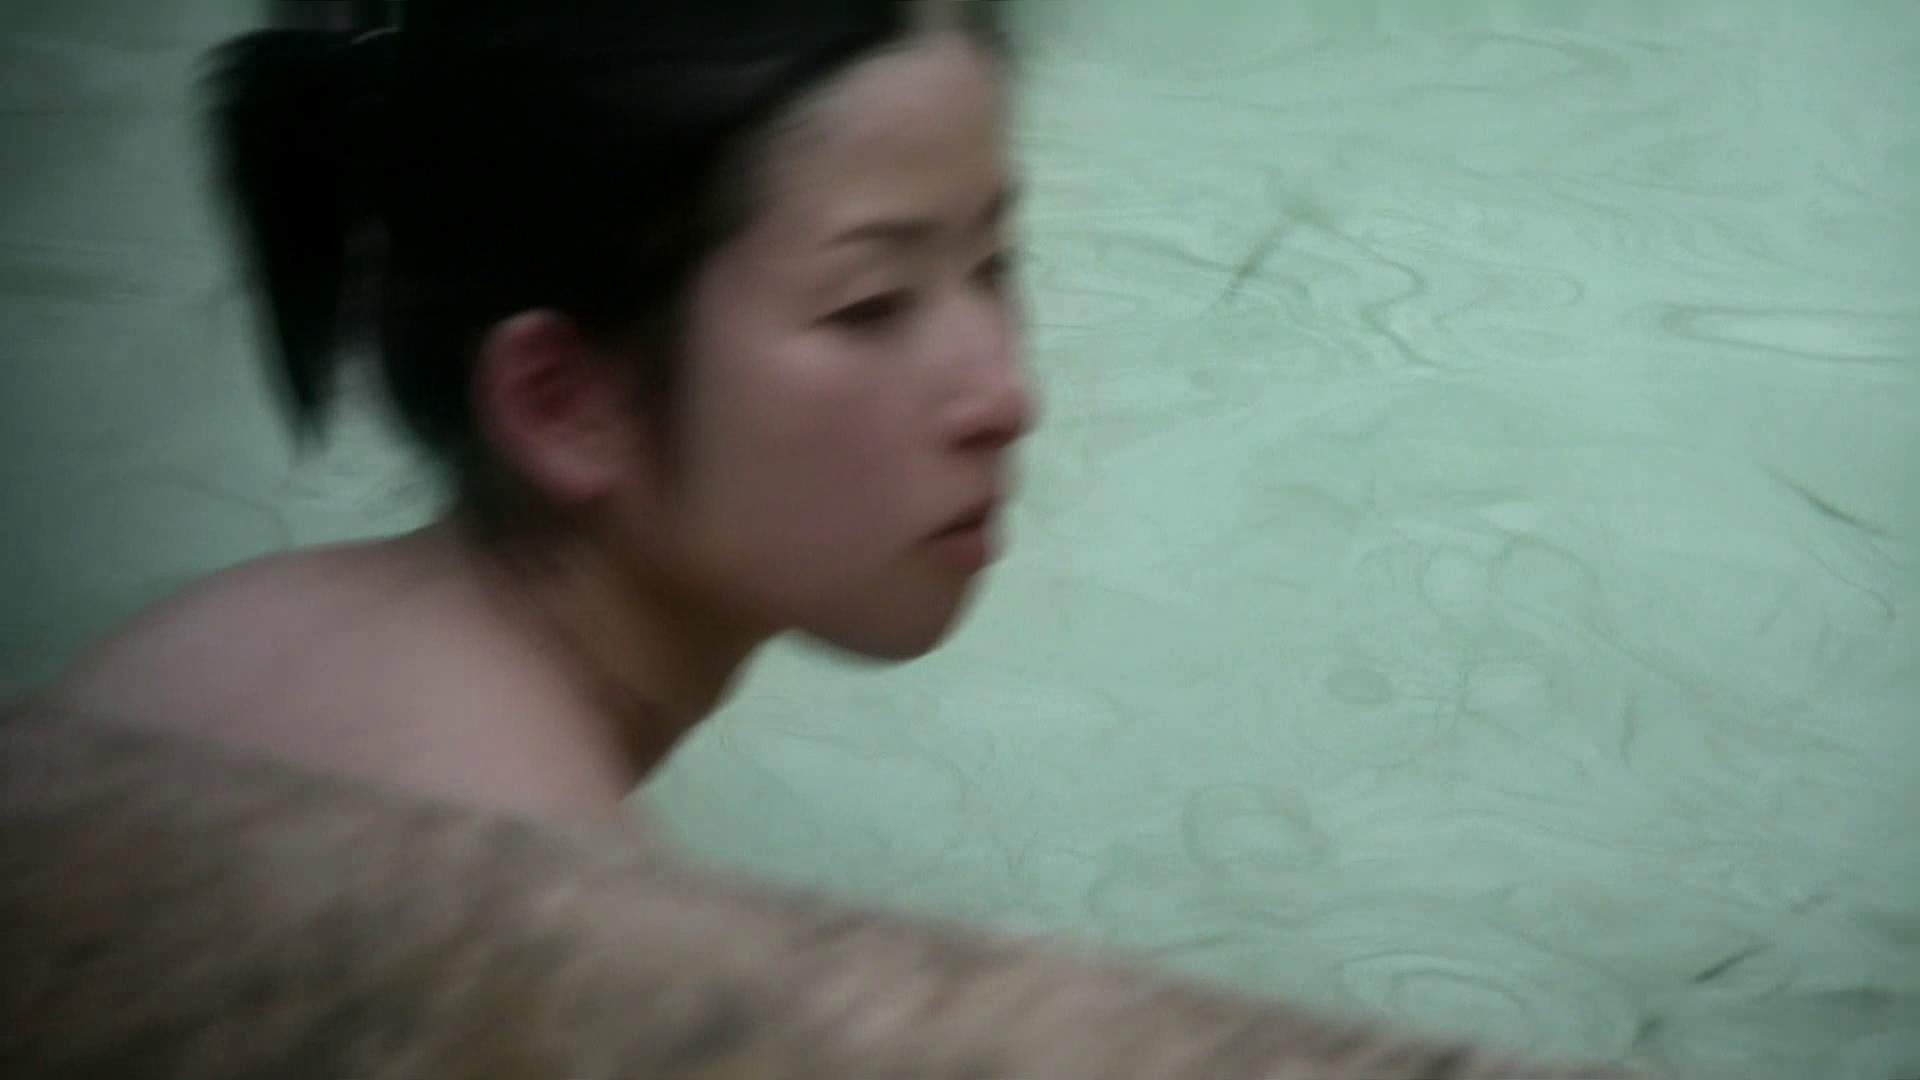 Aquaな露天風呂Vol.656 盗撮 AV無料 72画像 32